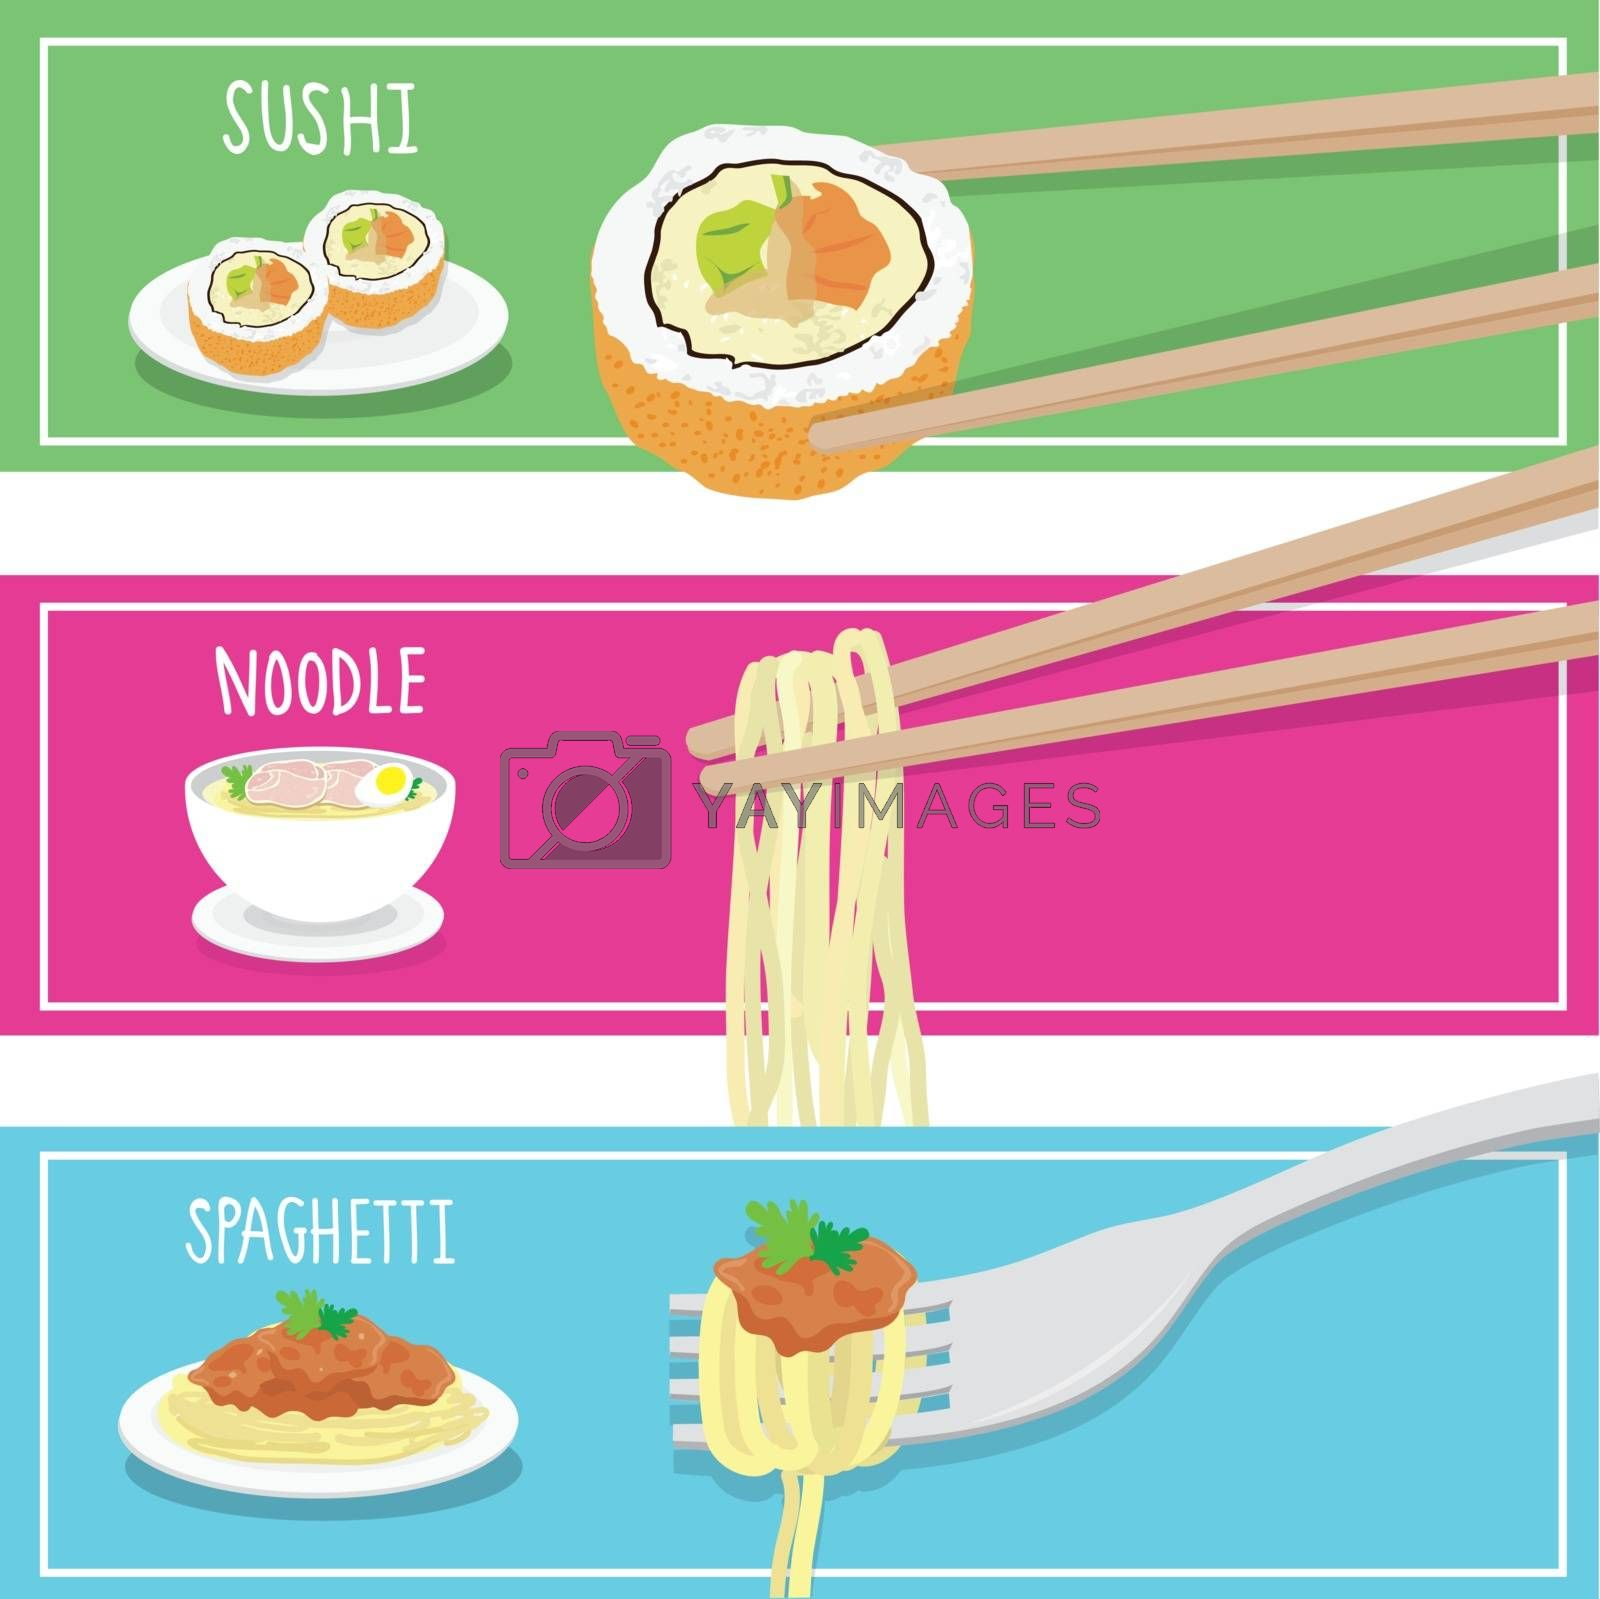 Royalty free image of International Food Sushi Noodle Spaghetti cartoon vector by Ienjoyeverytime